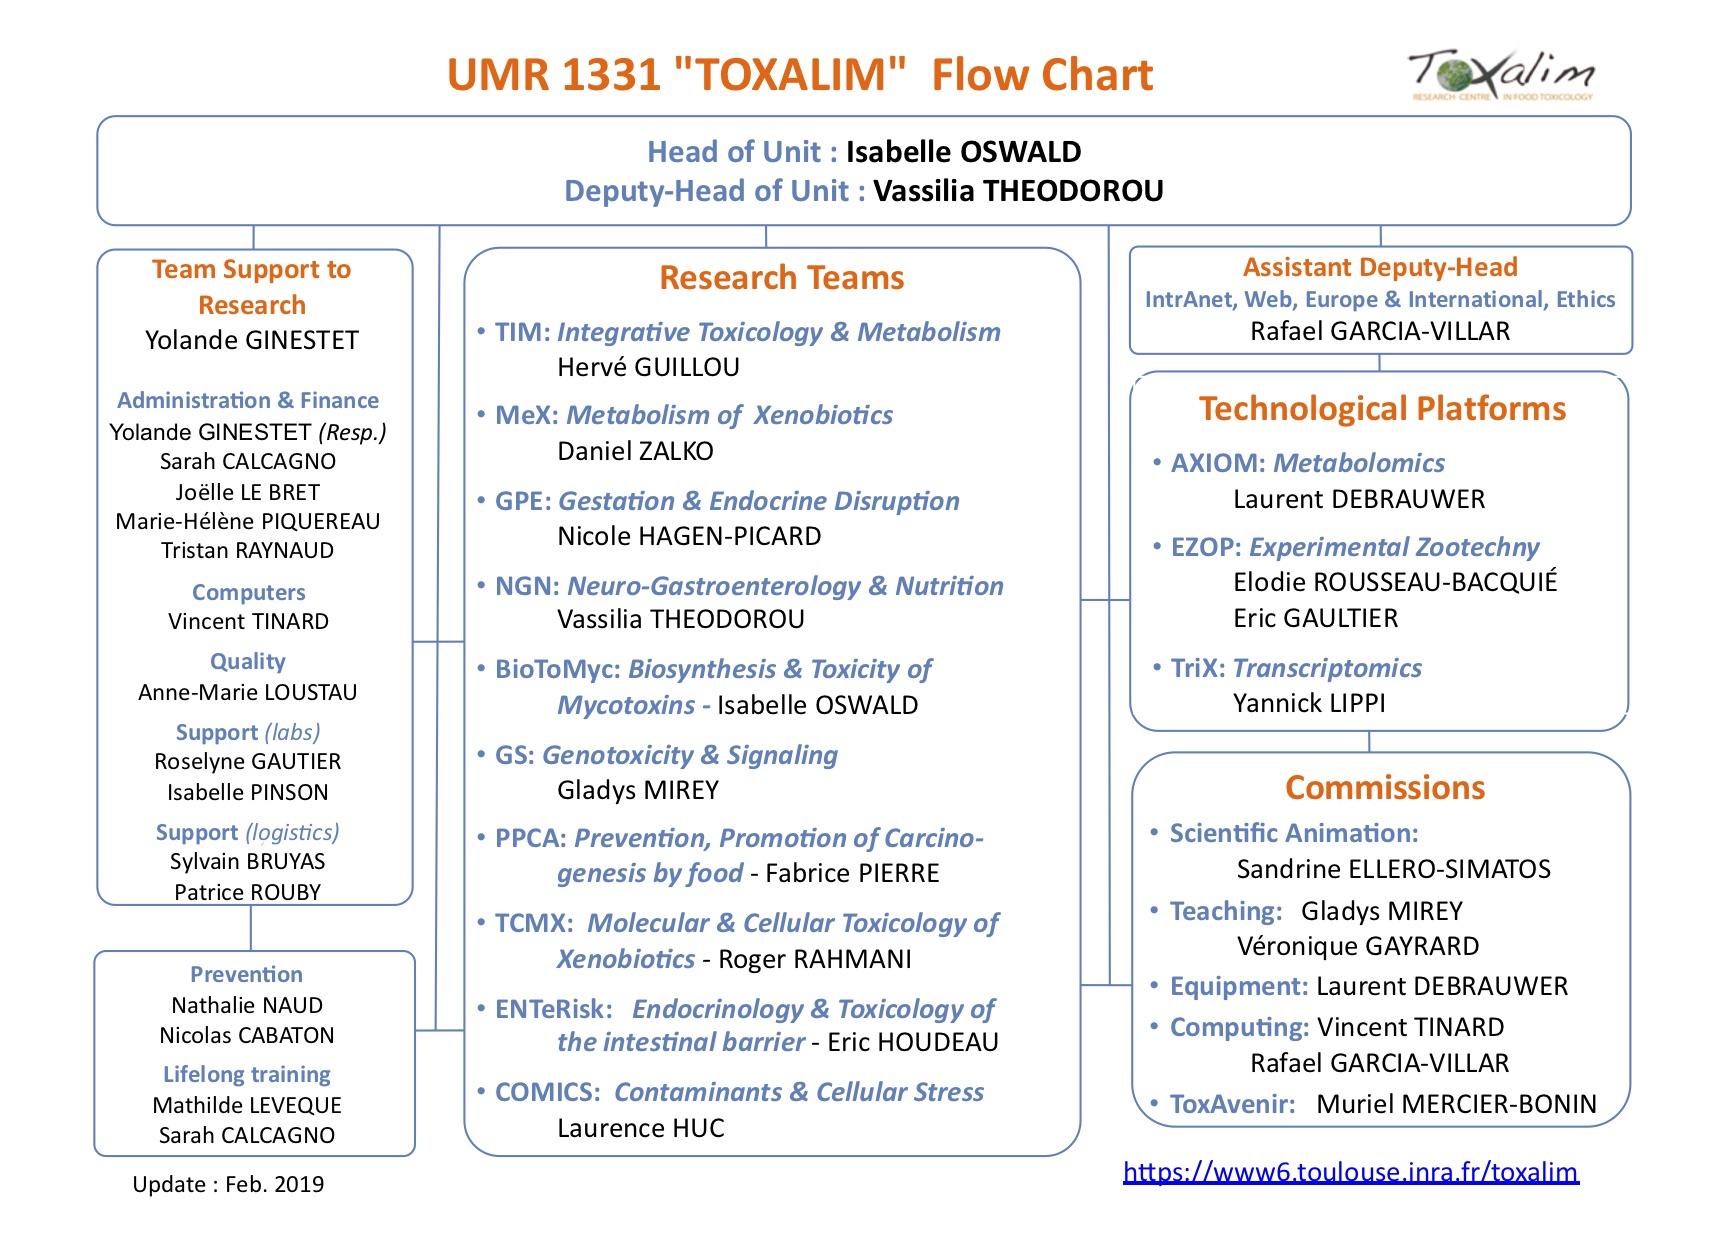 toxalim organisation flowchart_V14_201809